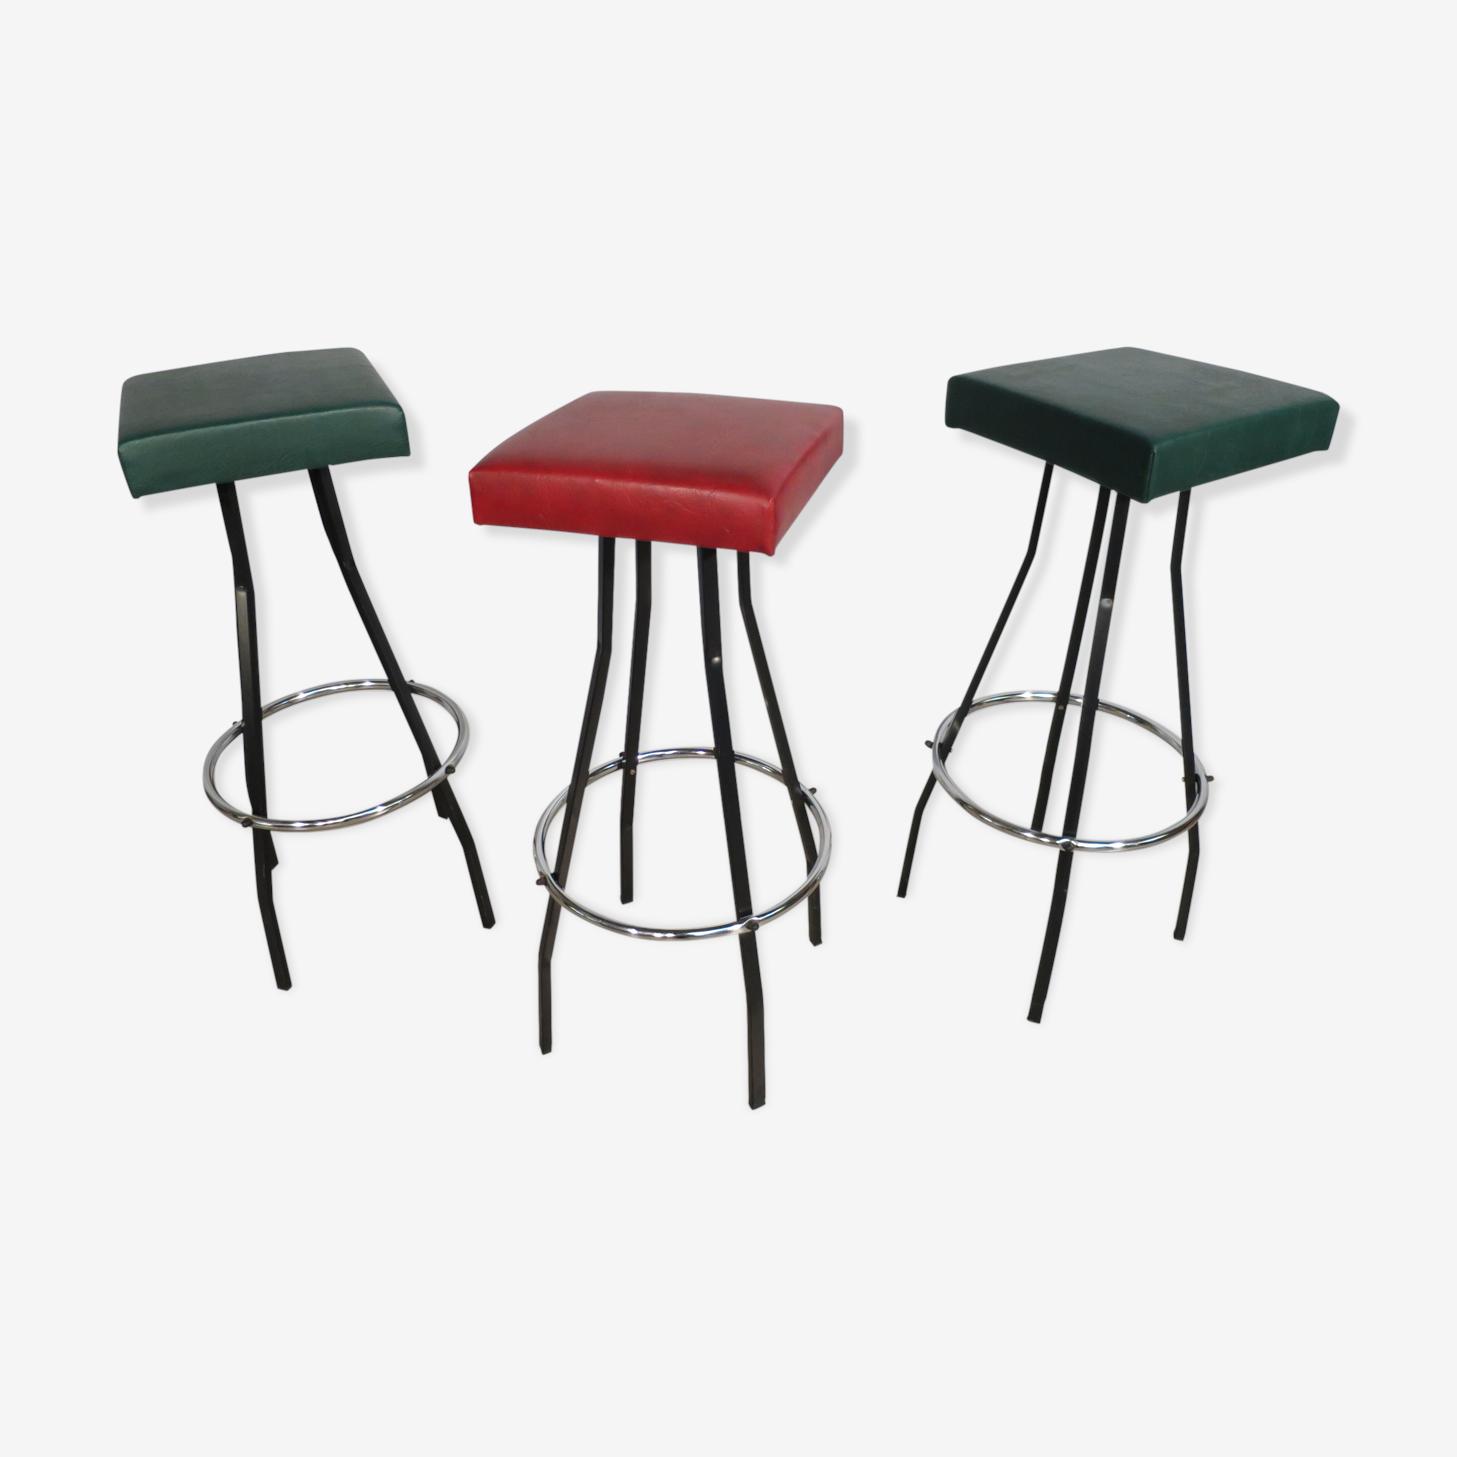 Set of 3 stools years 60